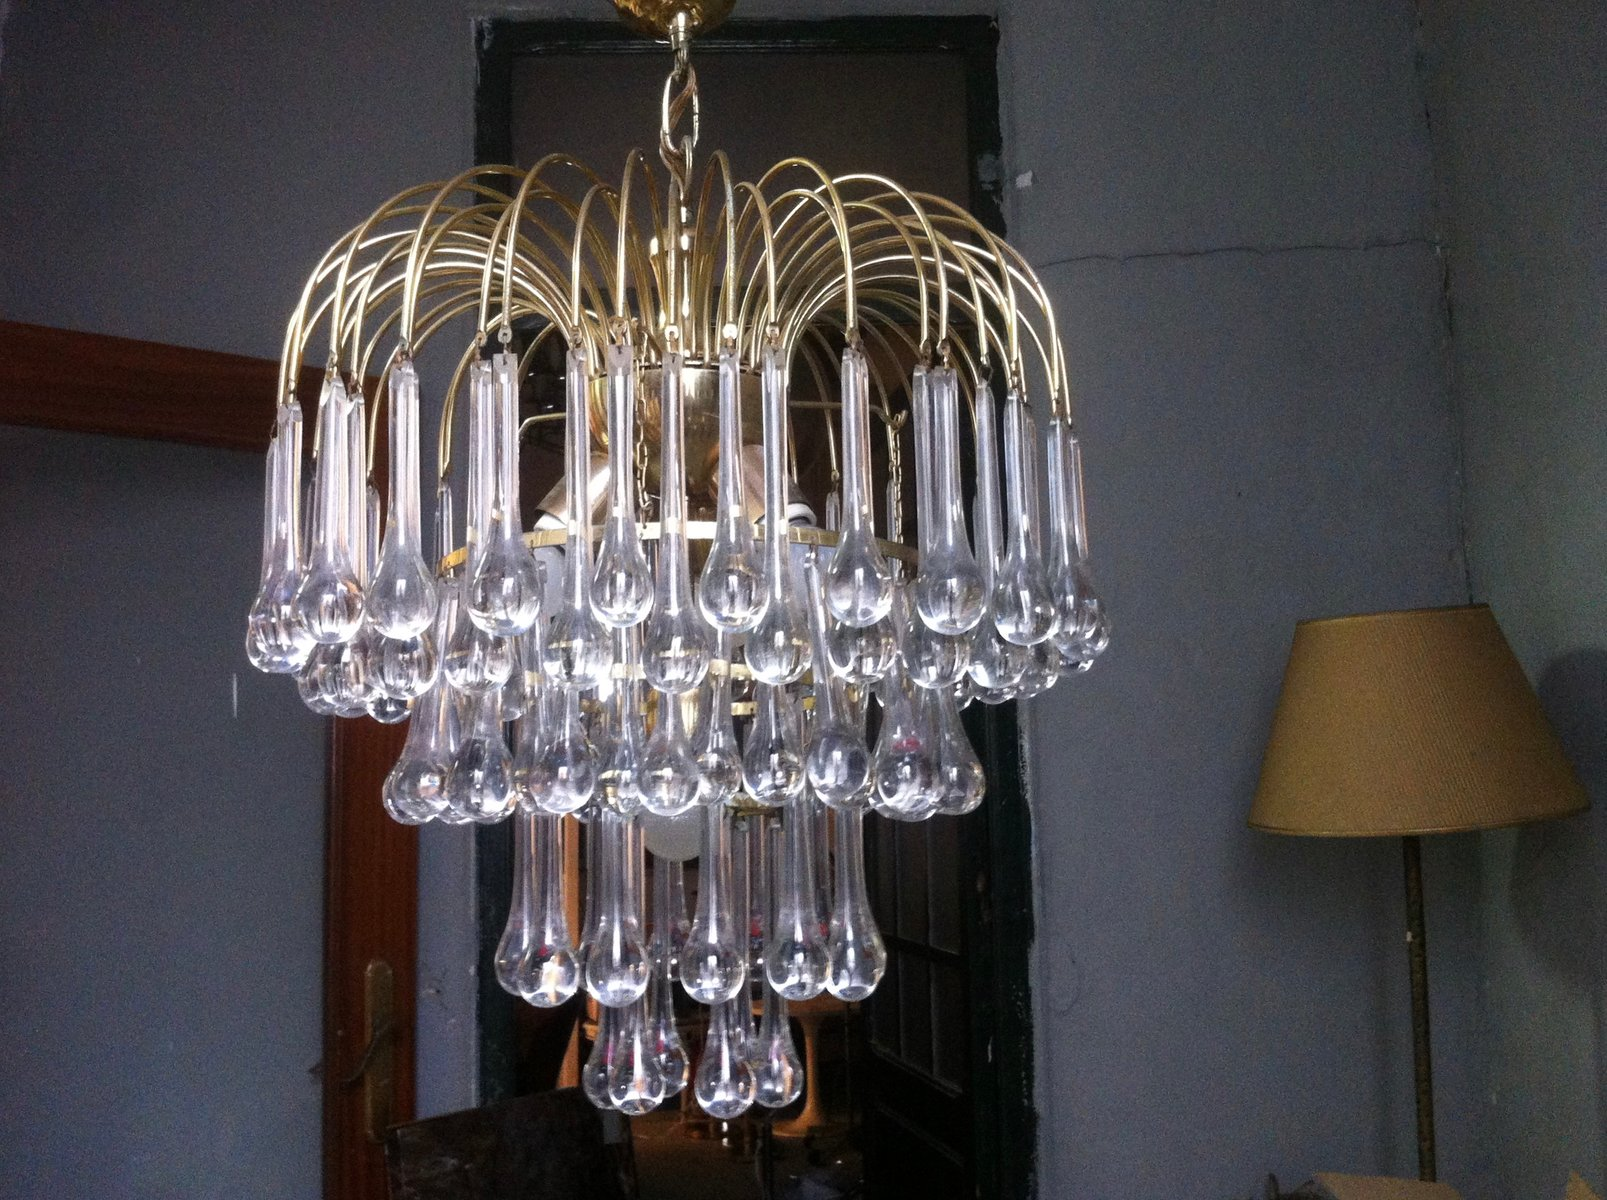 Come Pulire I Lampadari Di Murano.Gocce Di Vetro Per Lampadario Ricambi Per Lampadari Vetro Annunci D